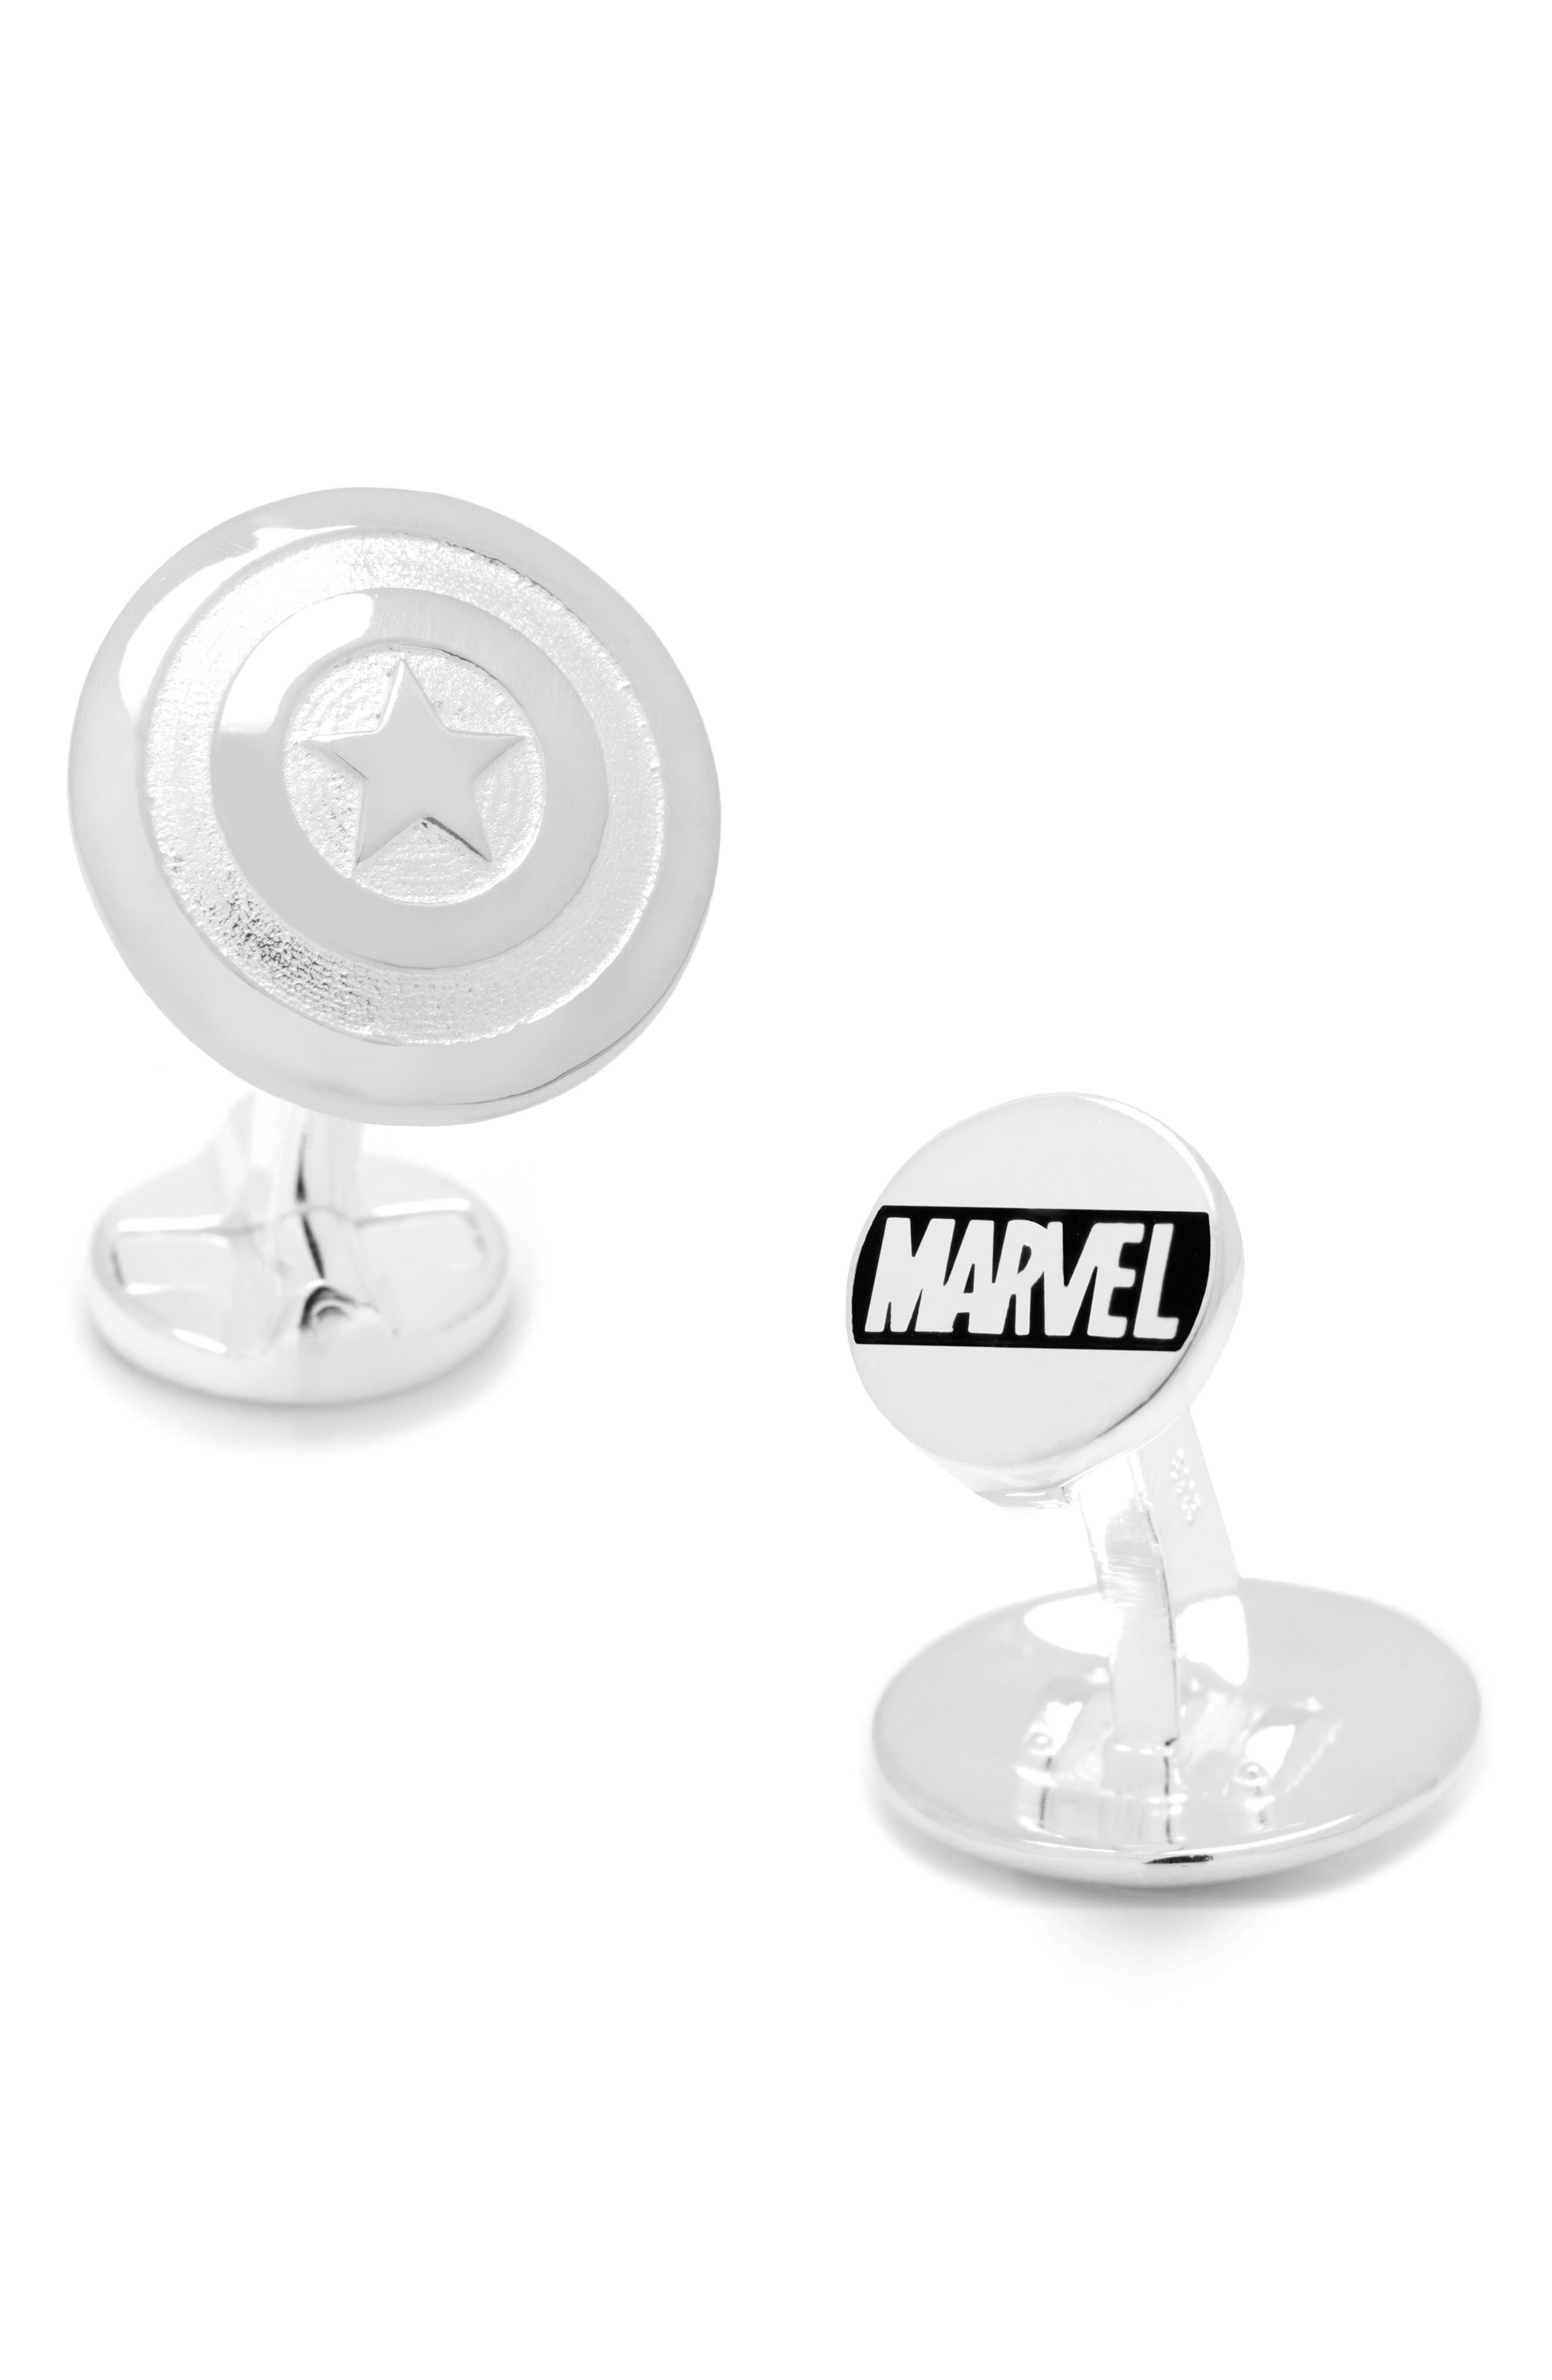 Captain America Cuff Links,                             Main thumbnail 1, color,                             Silver